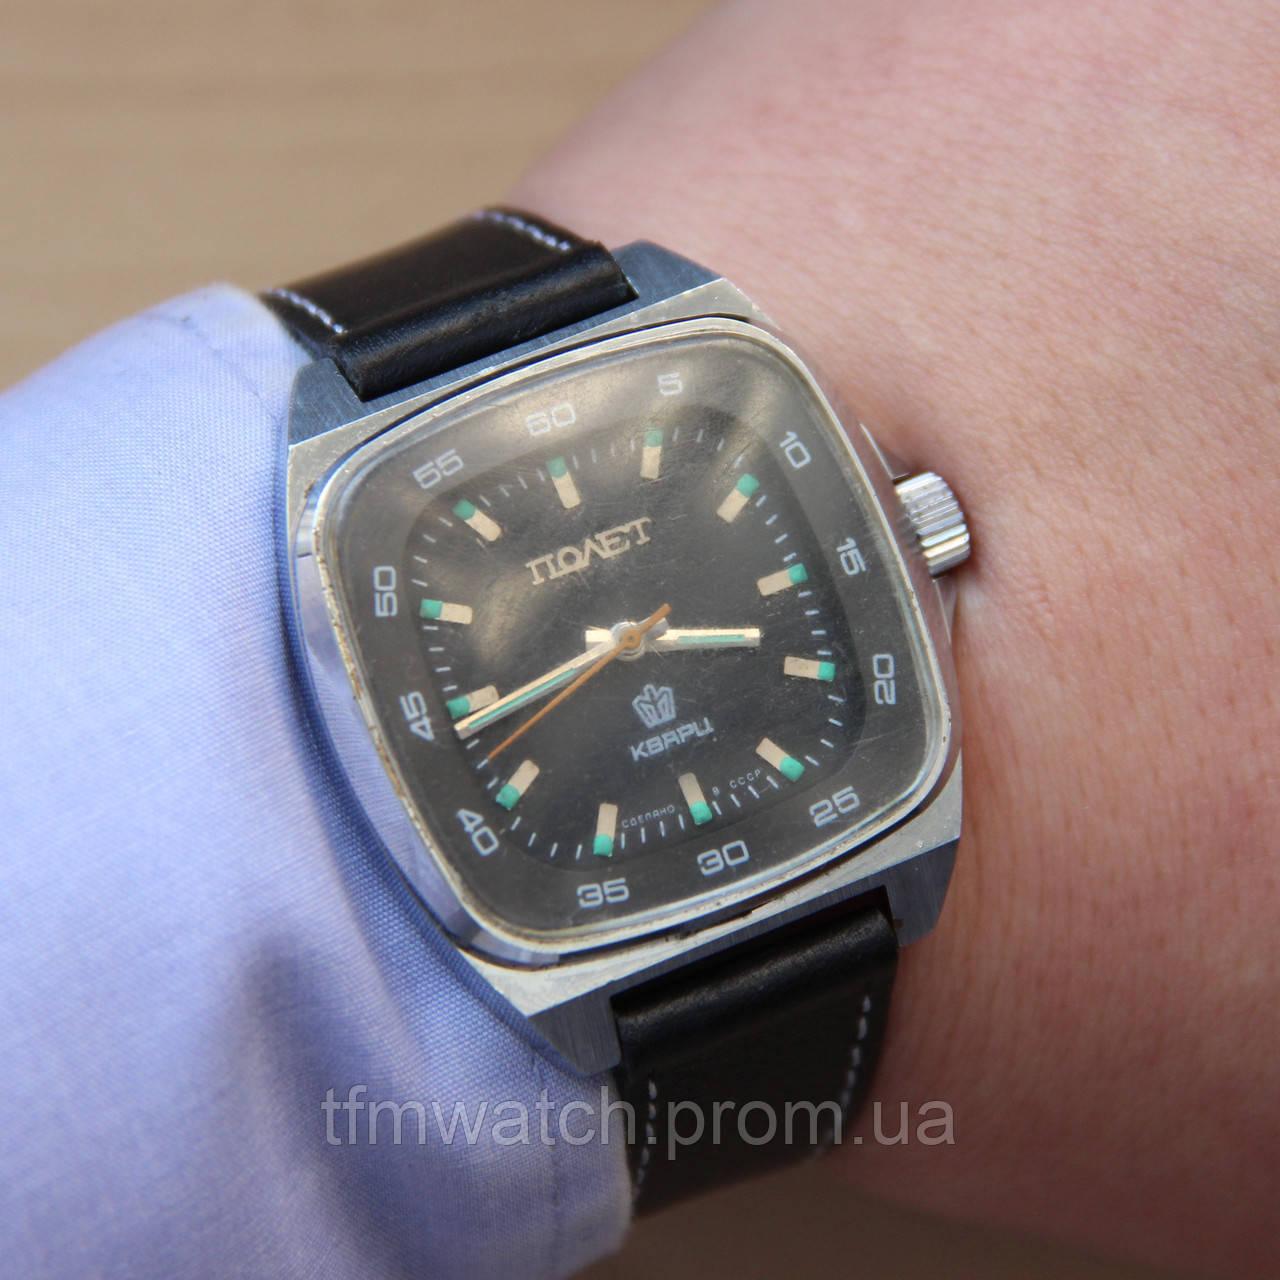 Полет Кварц кварцевые наручные часы СССР , фото 1